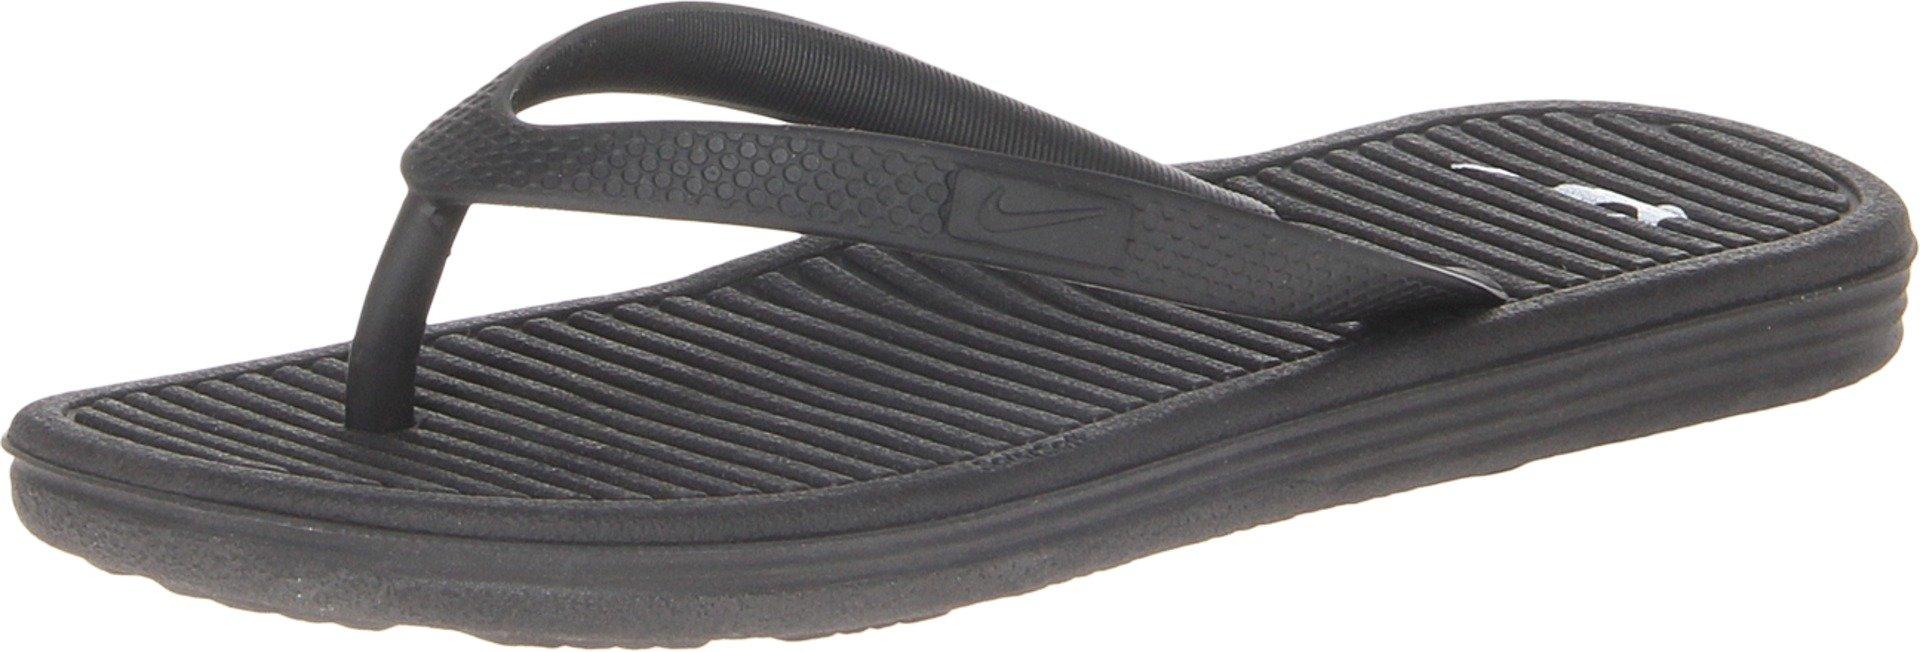 Nike Unisex Child Solarsoft Thong 2 (GS/PS) 11c Black